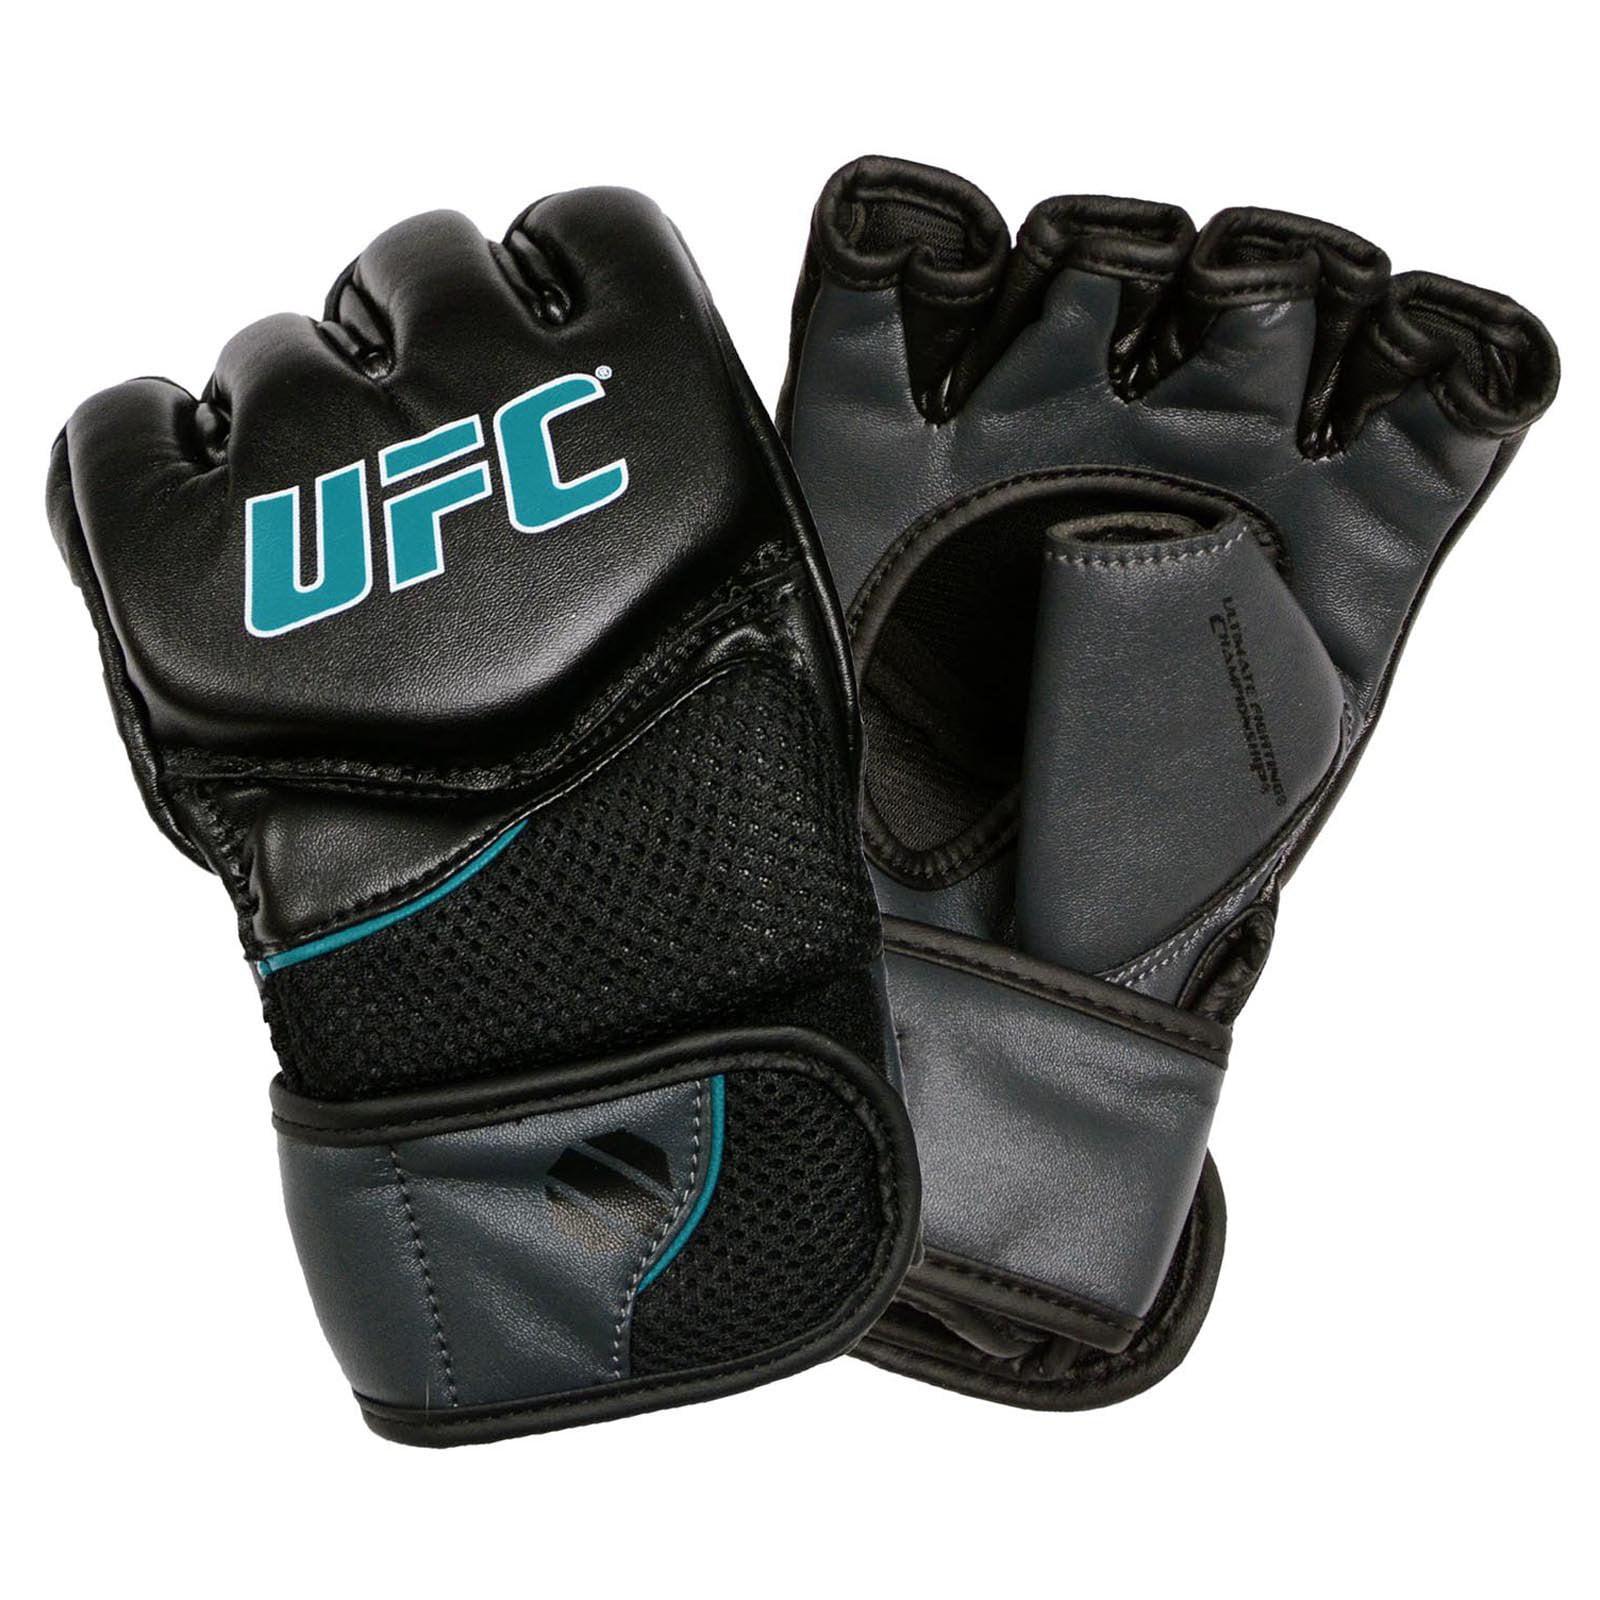 UFC Women's Comp MMA Glove - In Pairs